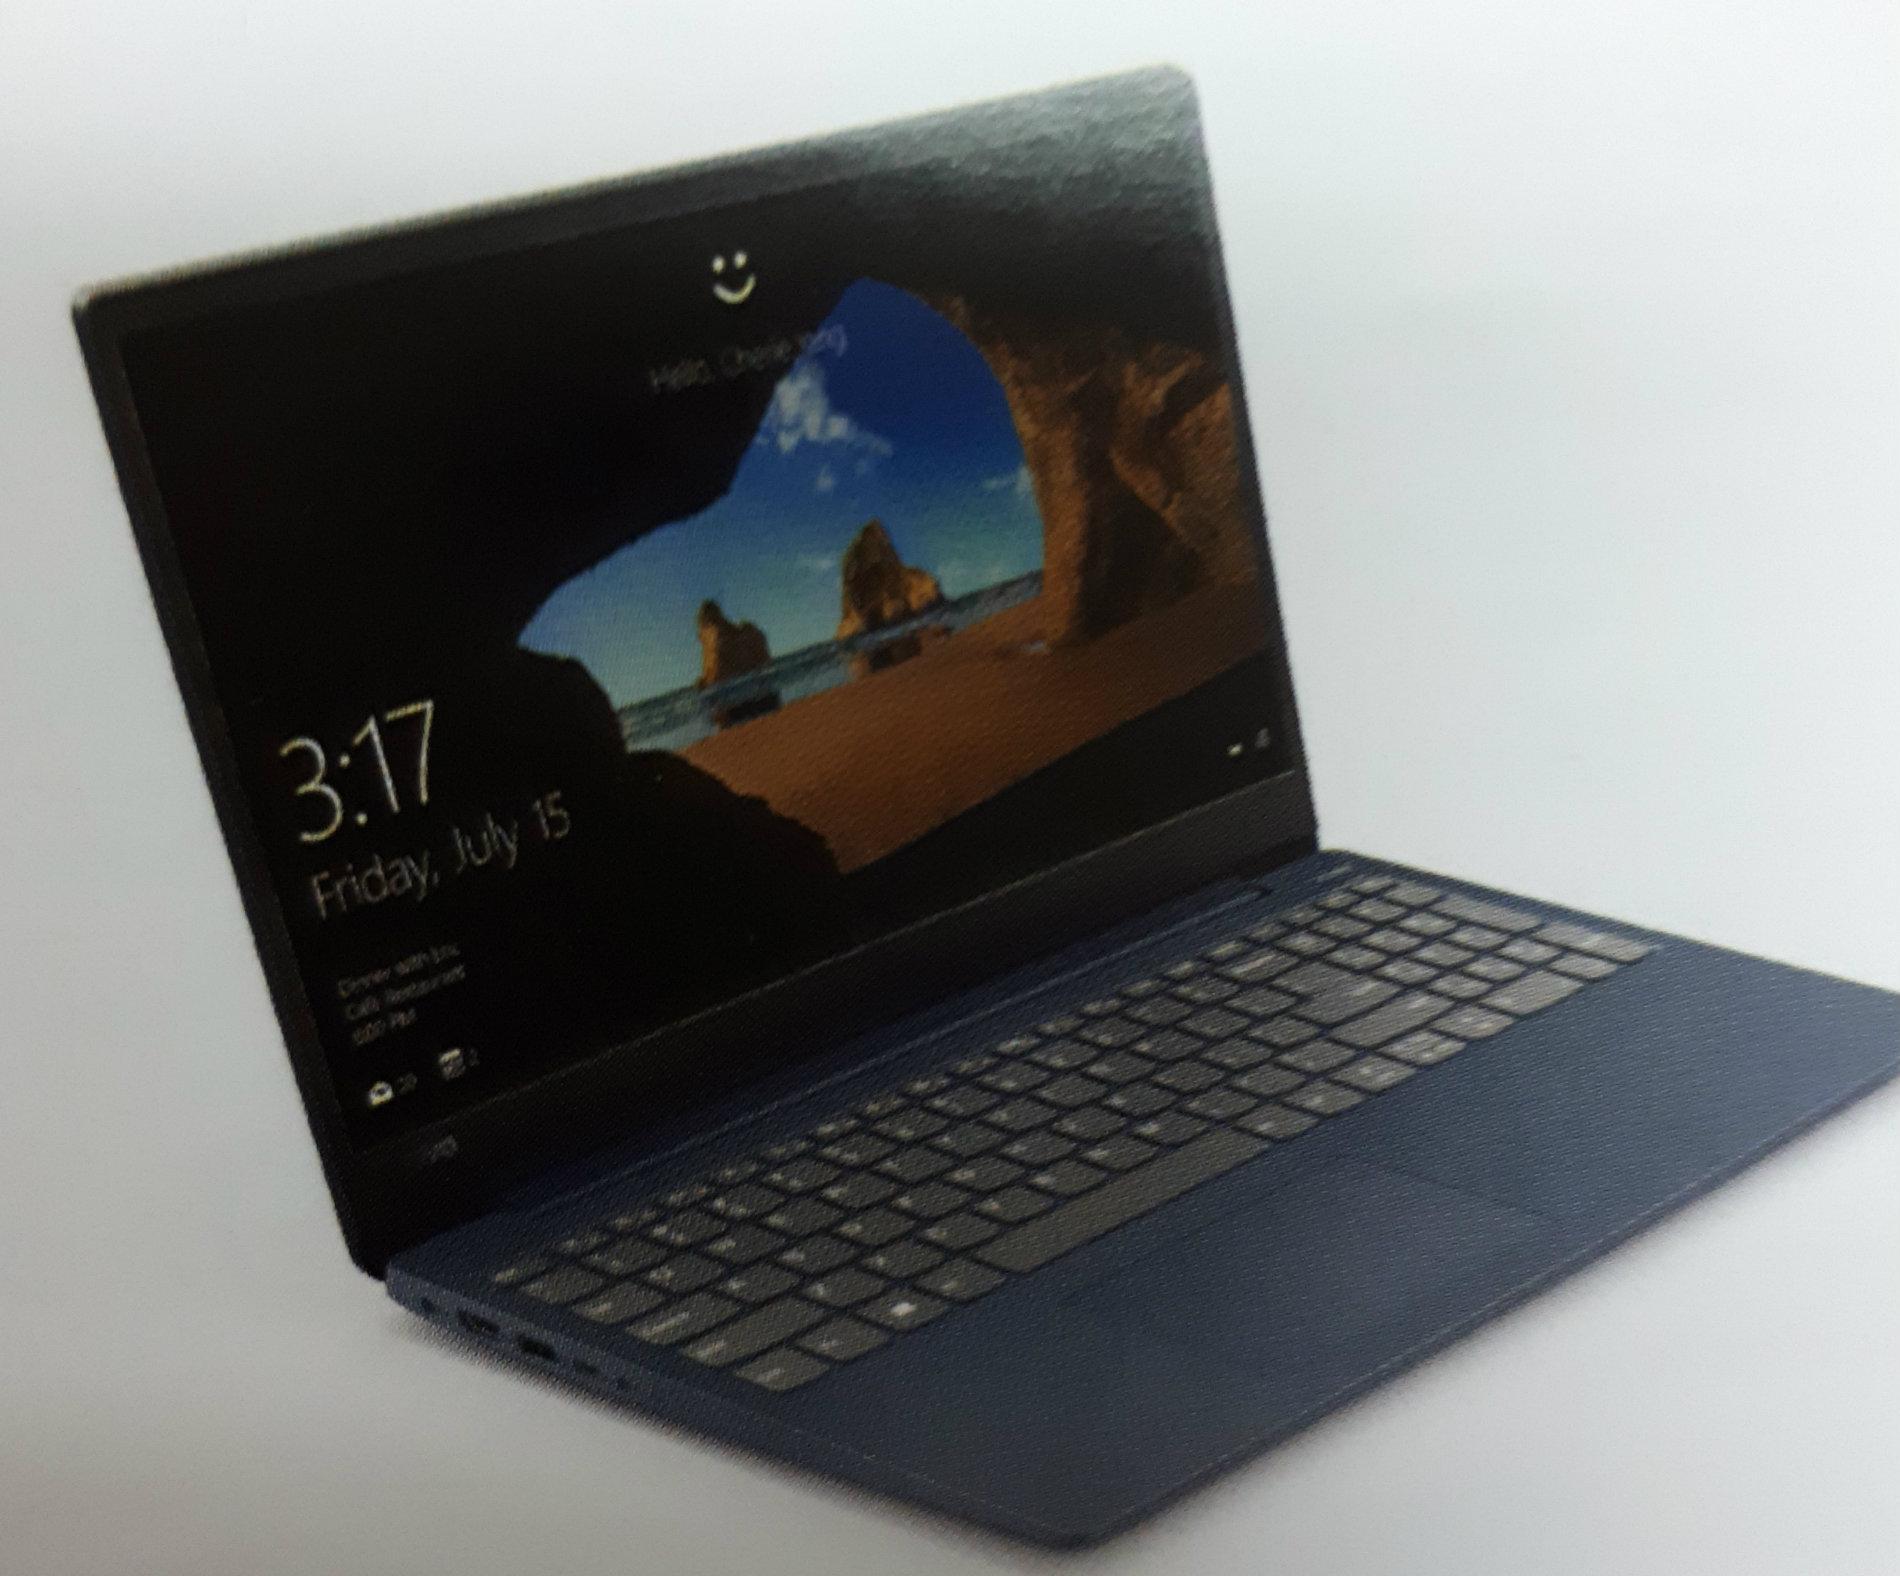 1 * 14 inch LENOVO IDEAPAD 330s (8th Generation Intel Processor i5 Intel Optane Memory)/20GB (4GB RAM+16GB Optane) 1 year ON-SITE Warranty with FREE items